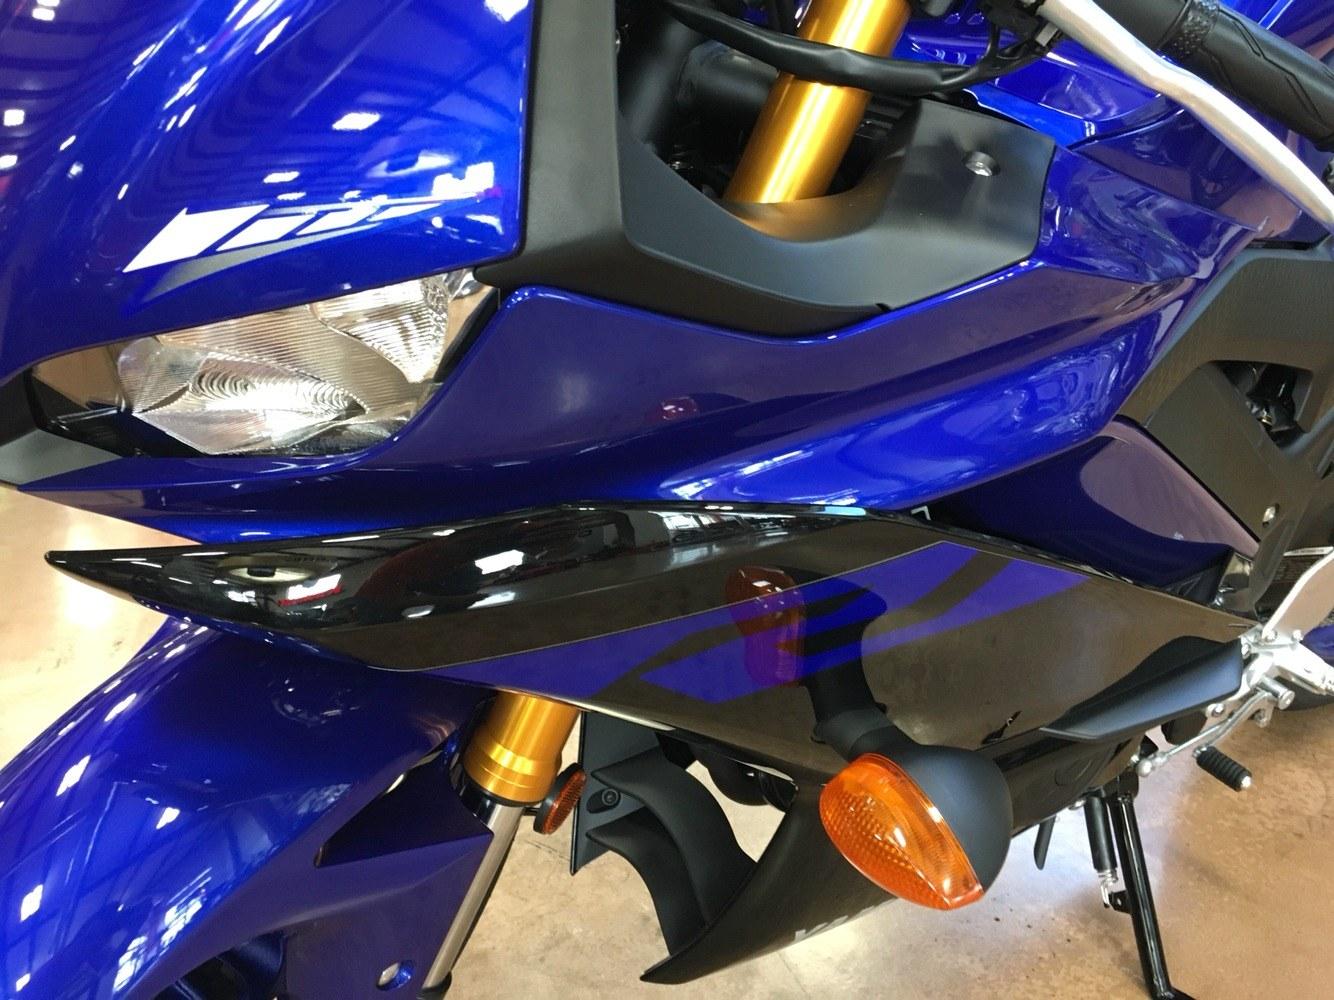 2019 Yamaha YZF-R3 10